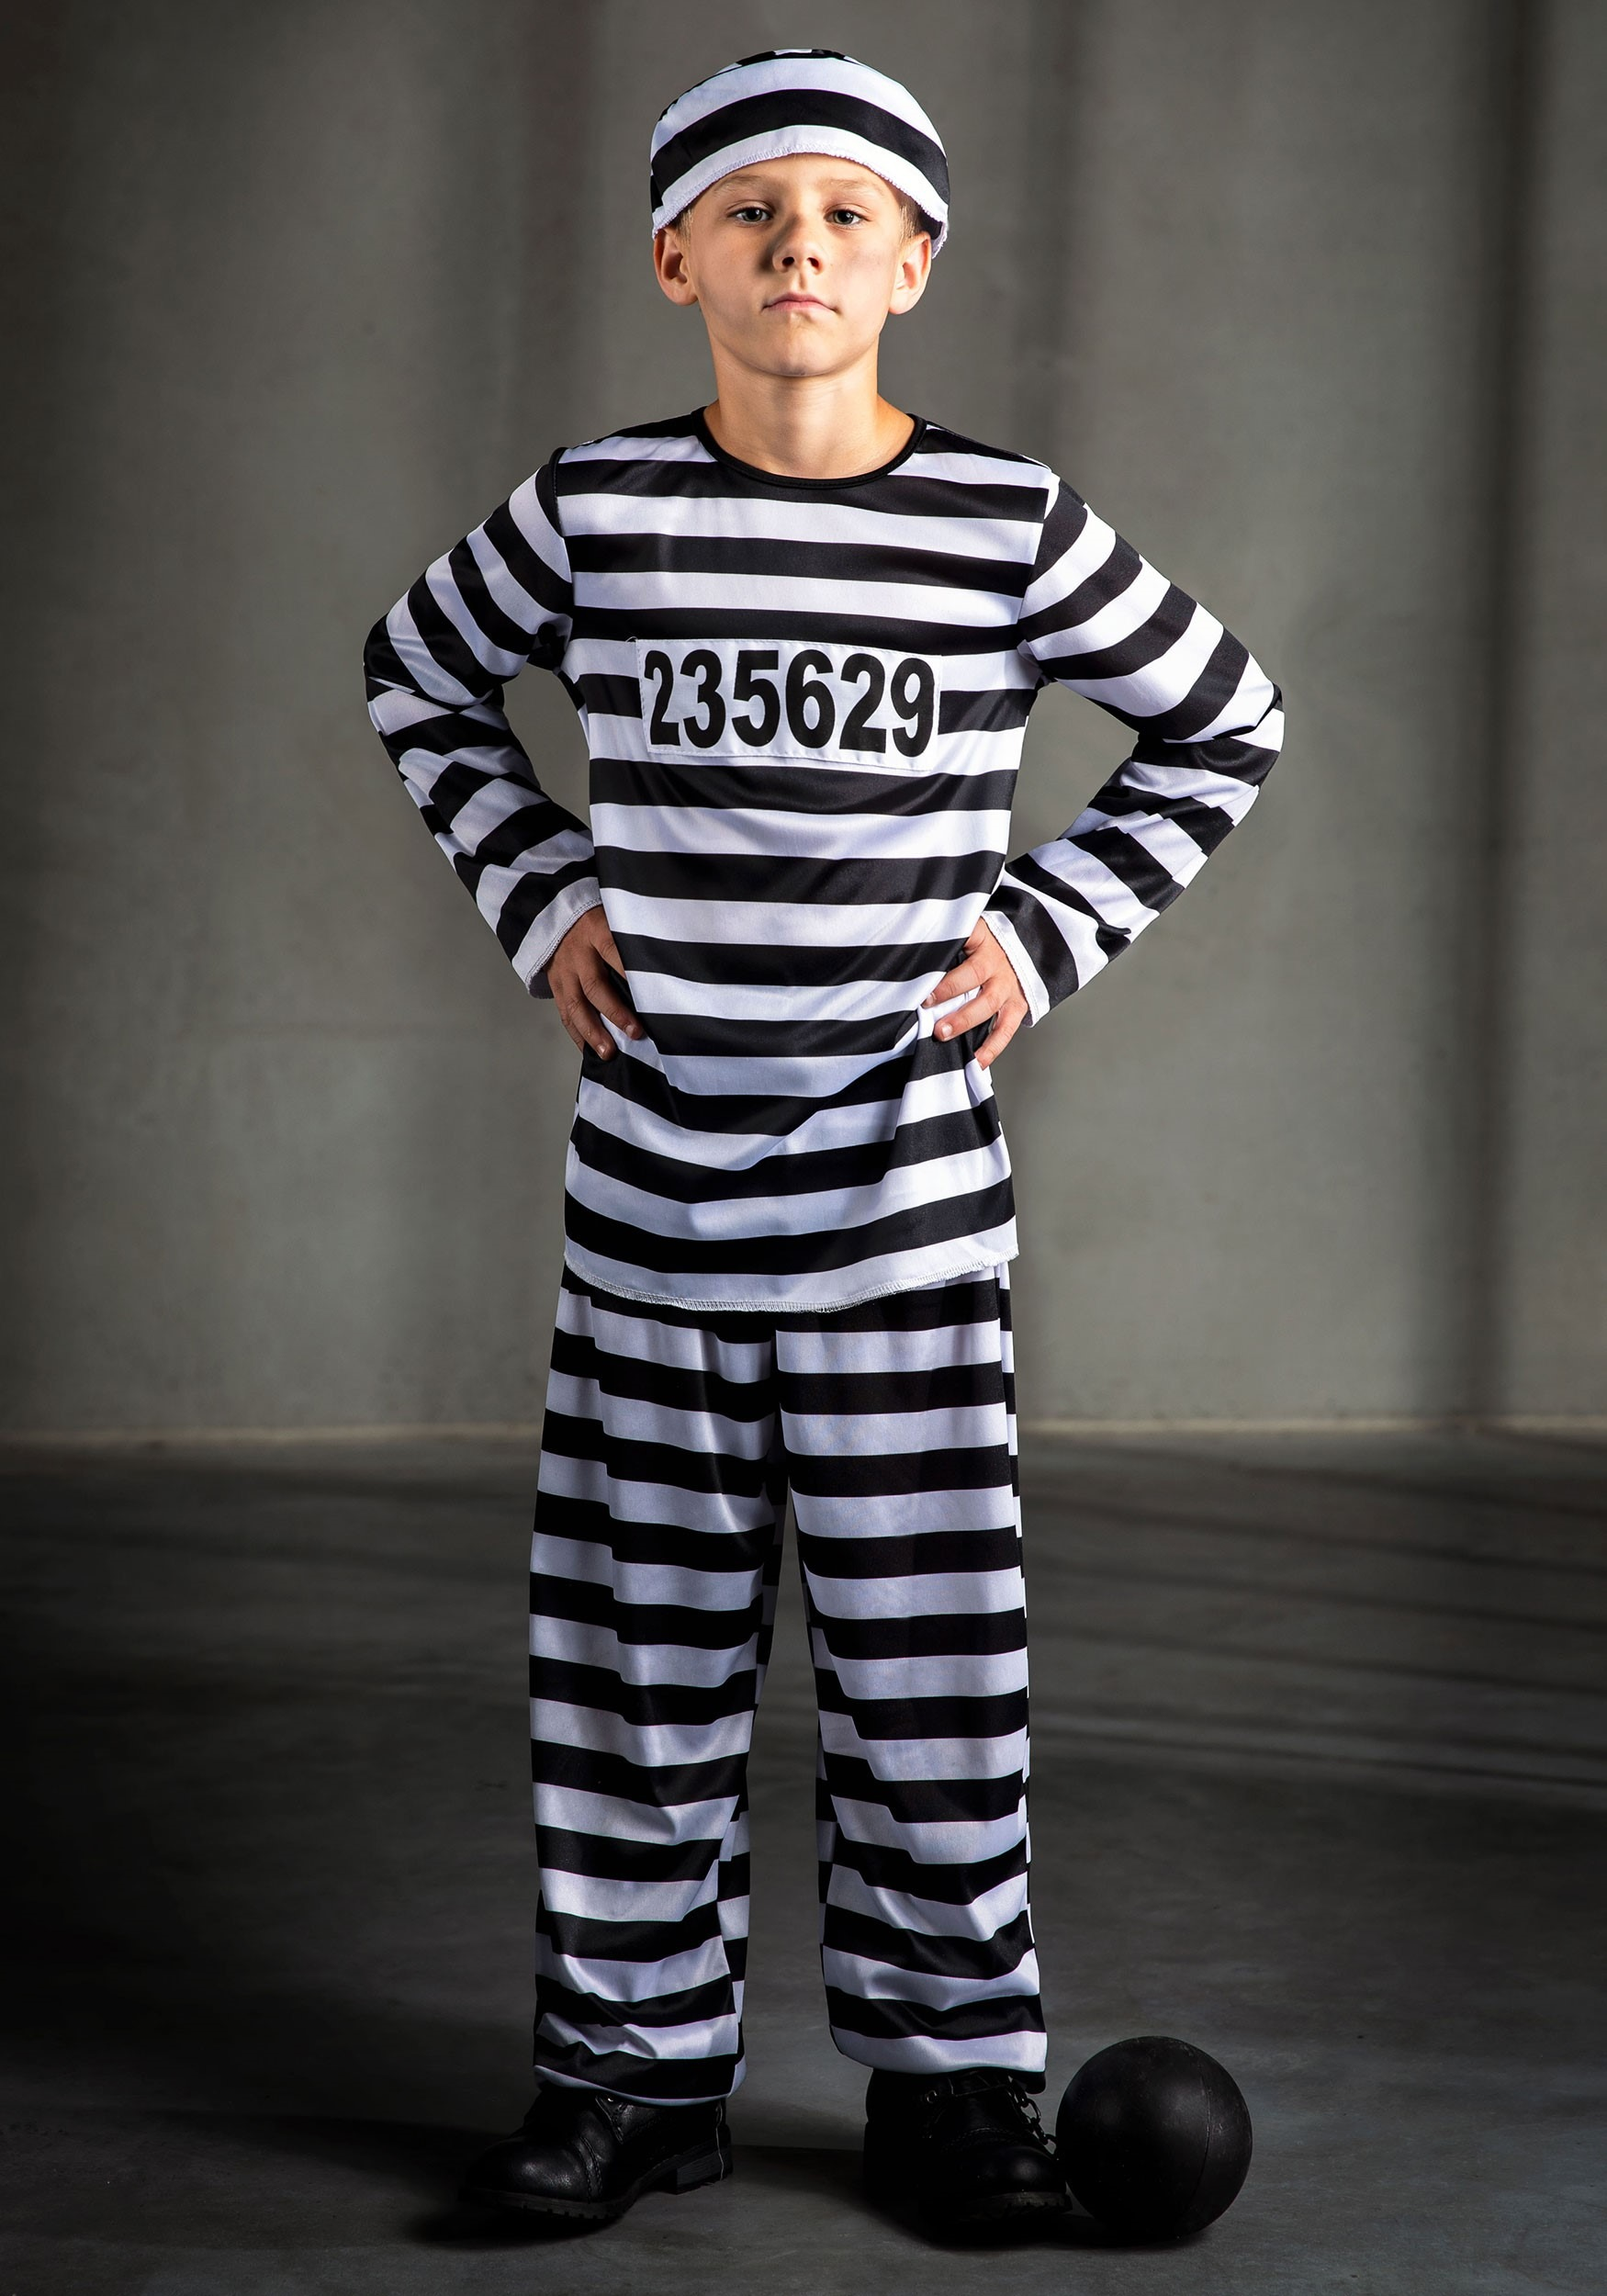 Prisoner on the Loose Costume  sc 1 st  Halloween Costume & Prisoner on the Loose Costume - Childrens Robber Costume